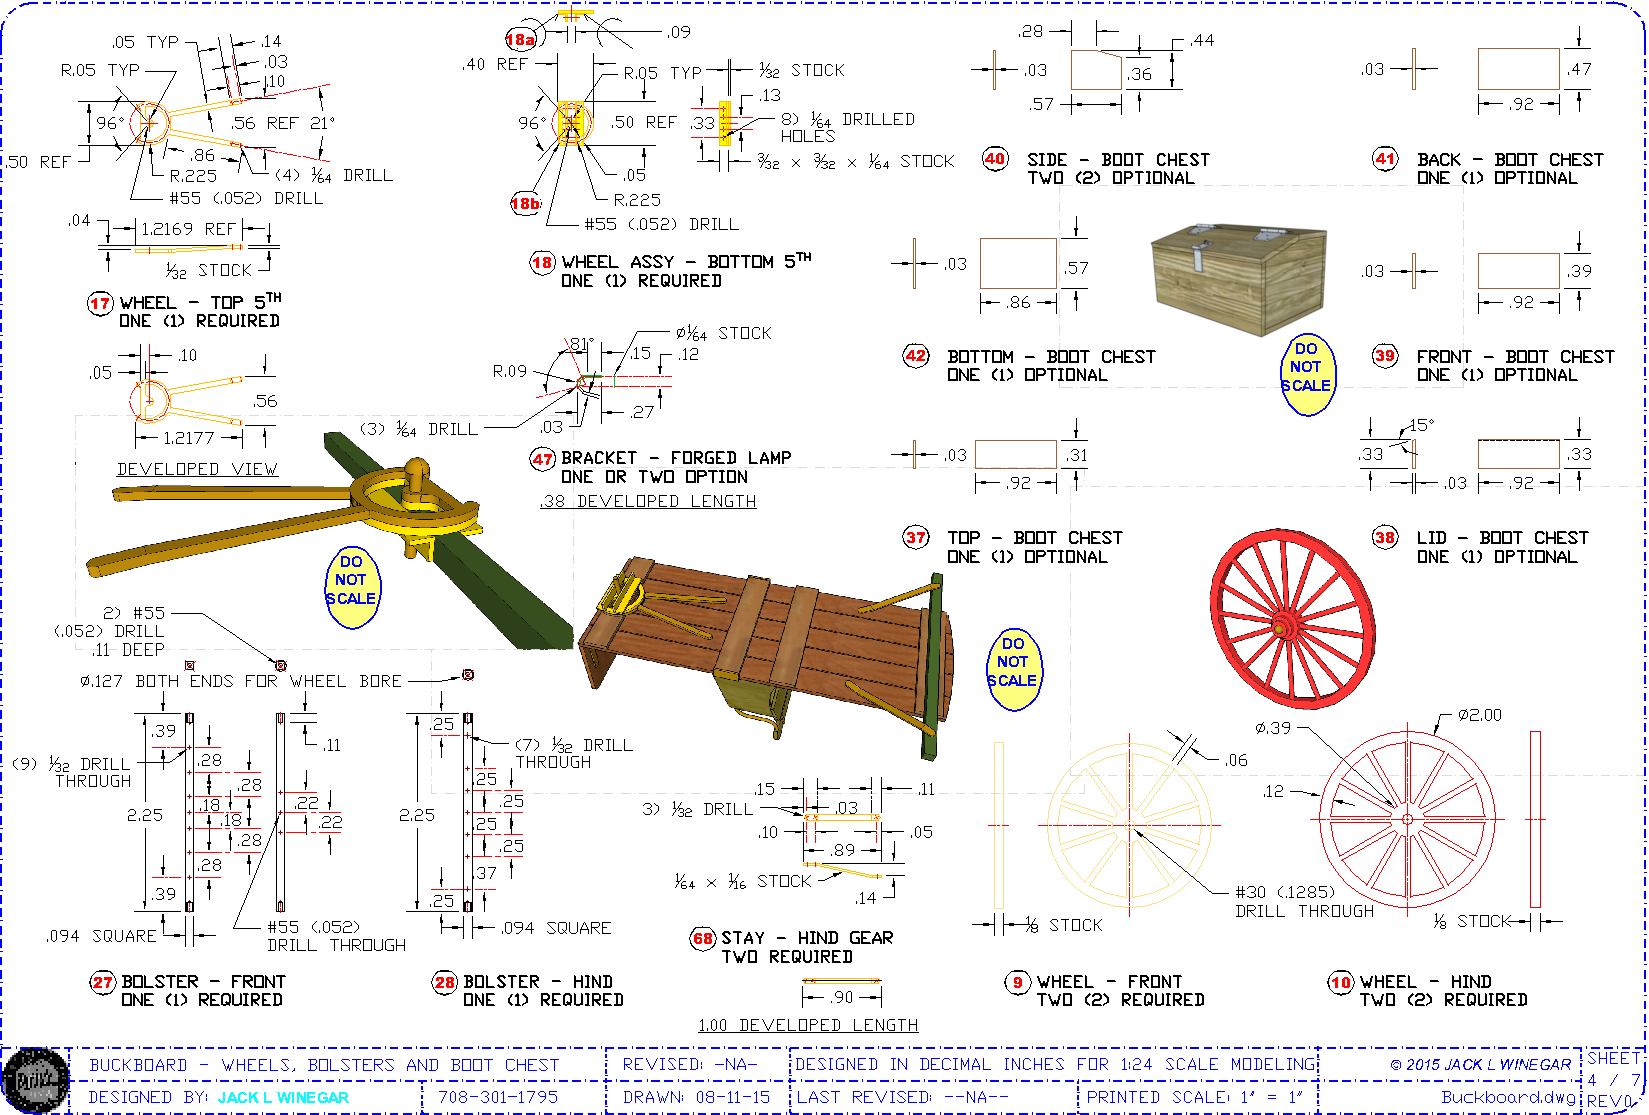 Sheet 4 Of 7 Super B 13 X 19 Plan Set Sheet Showing How To Build